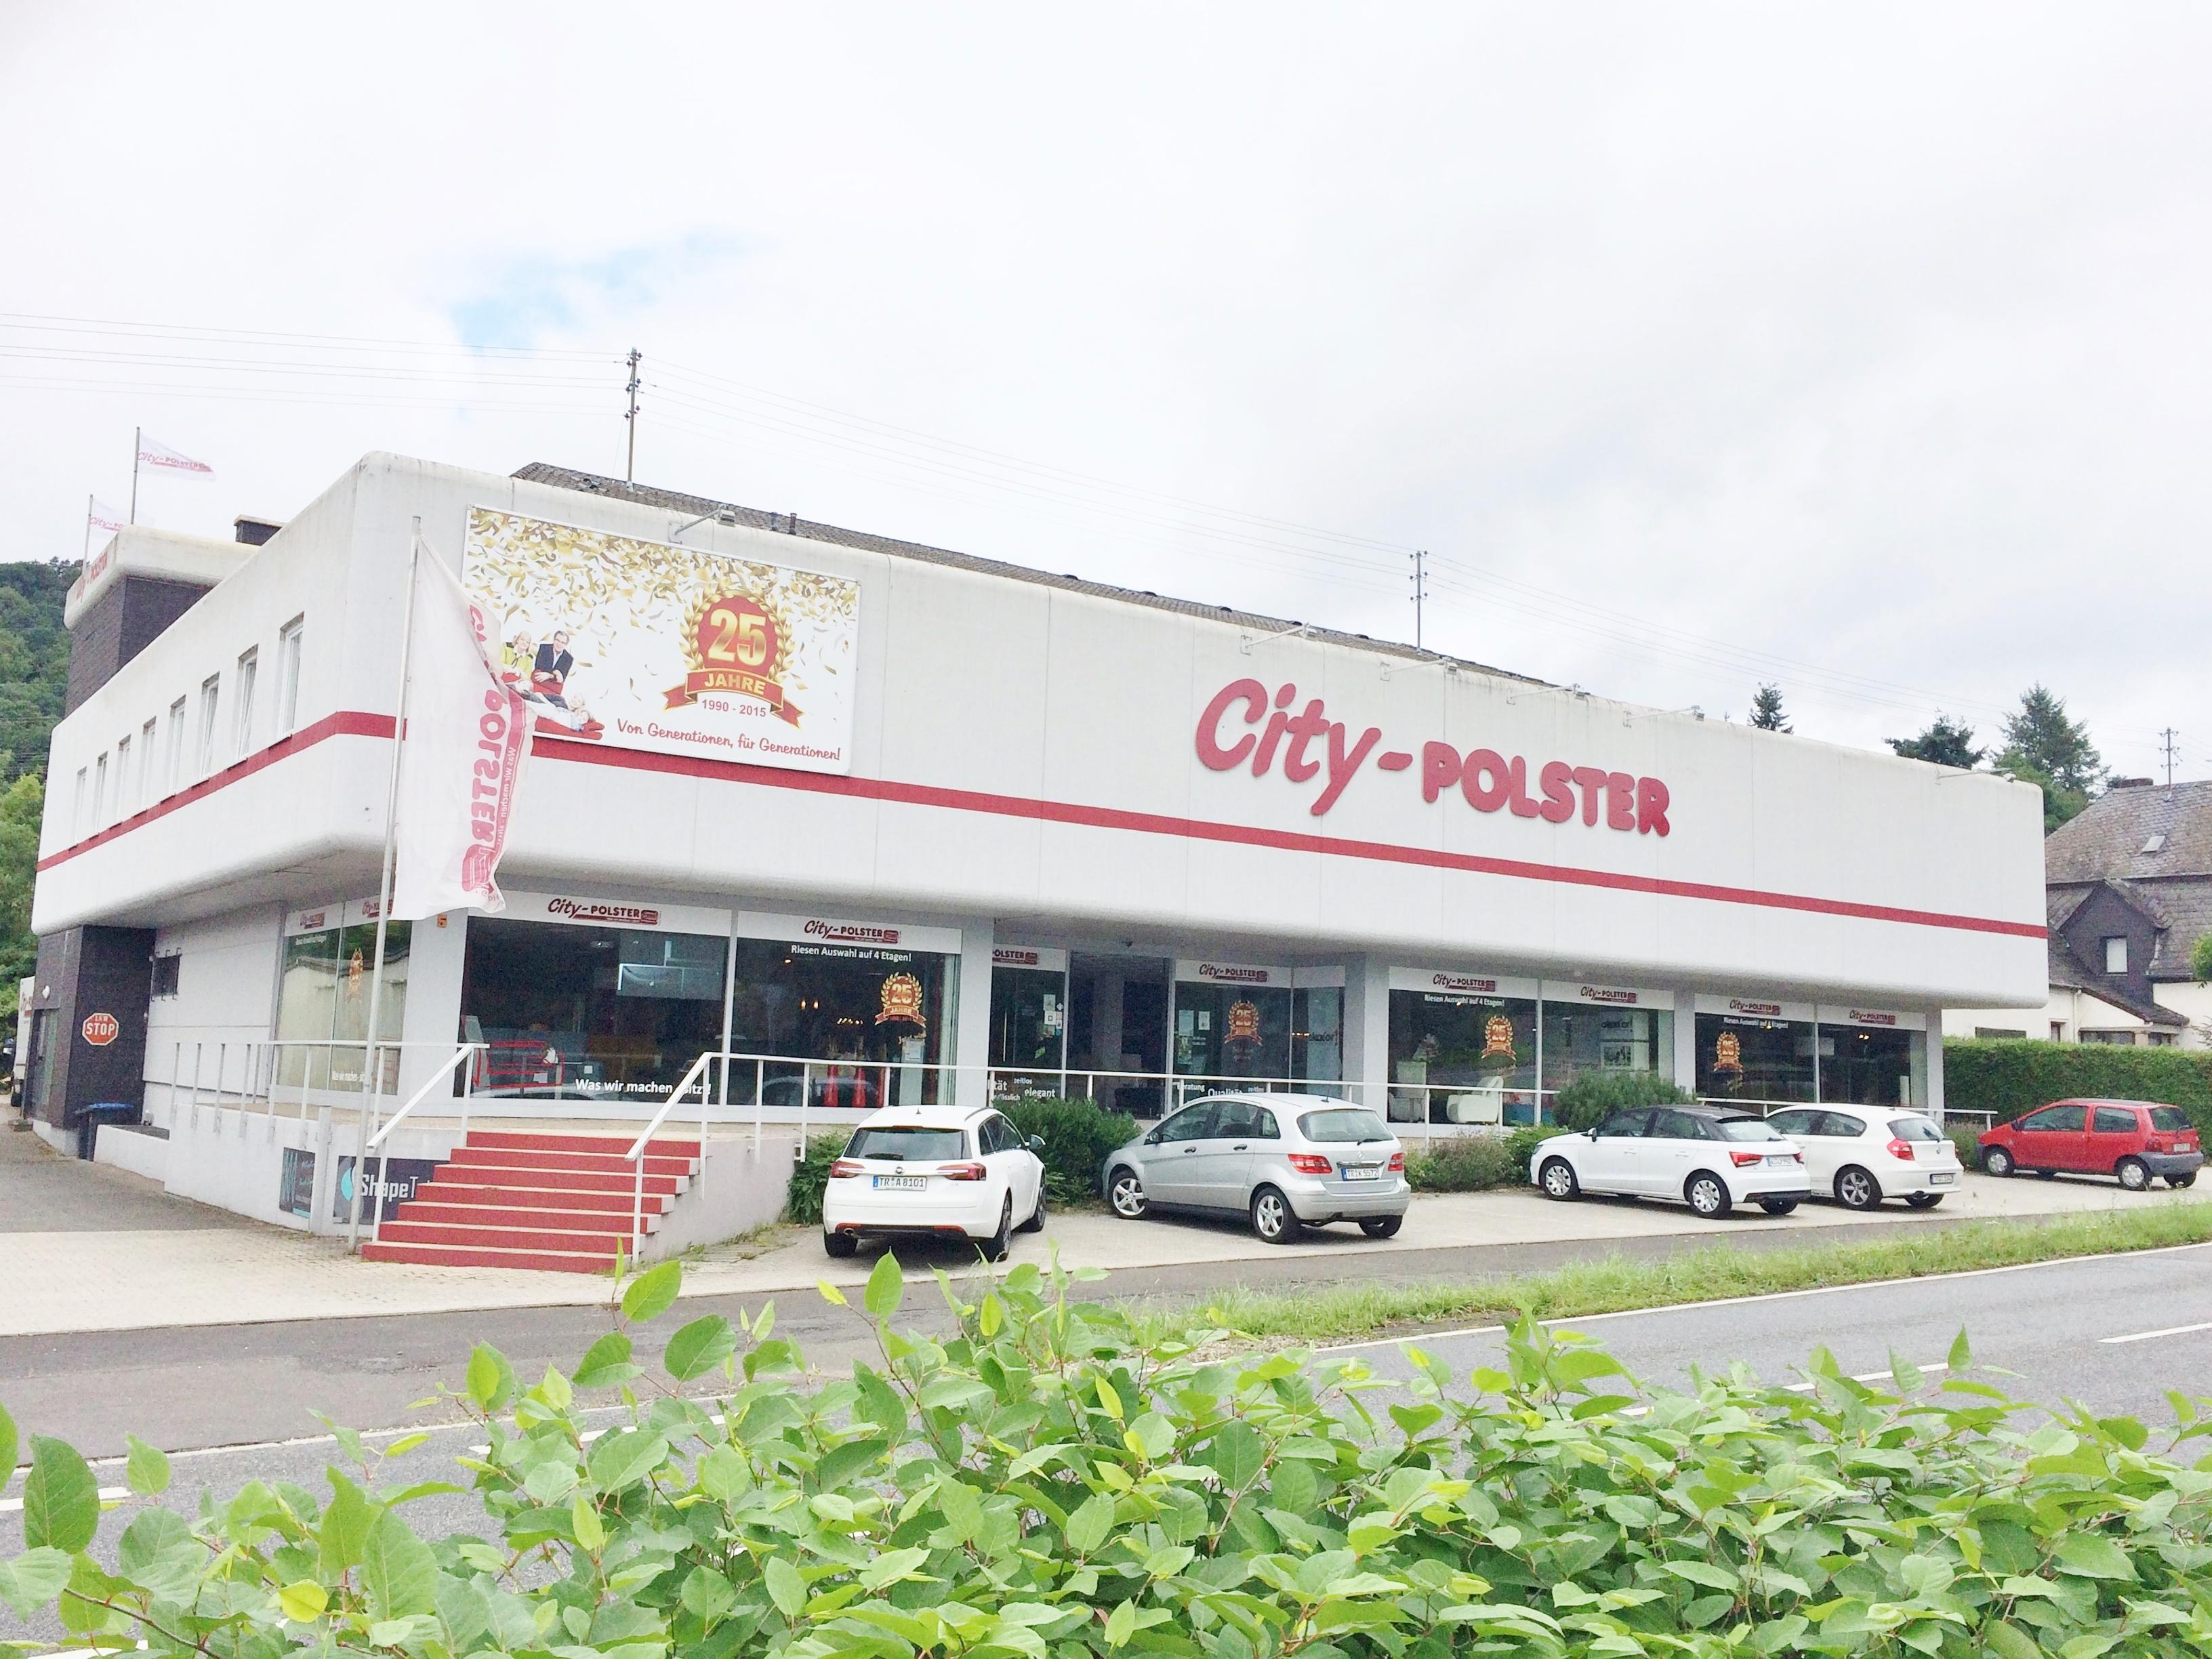 city-polster-trier-gmbh-trier-quint banner